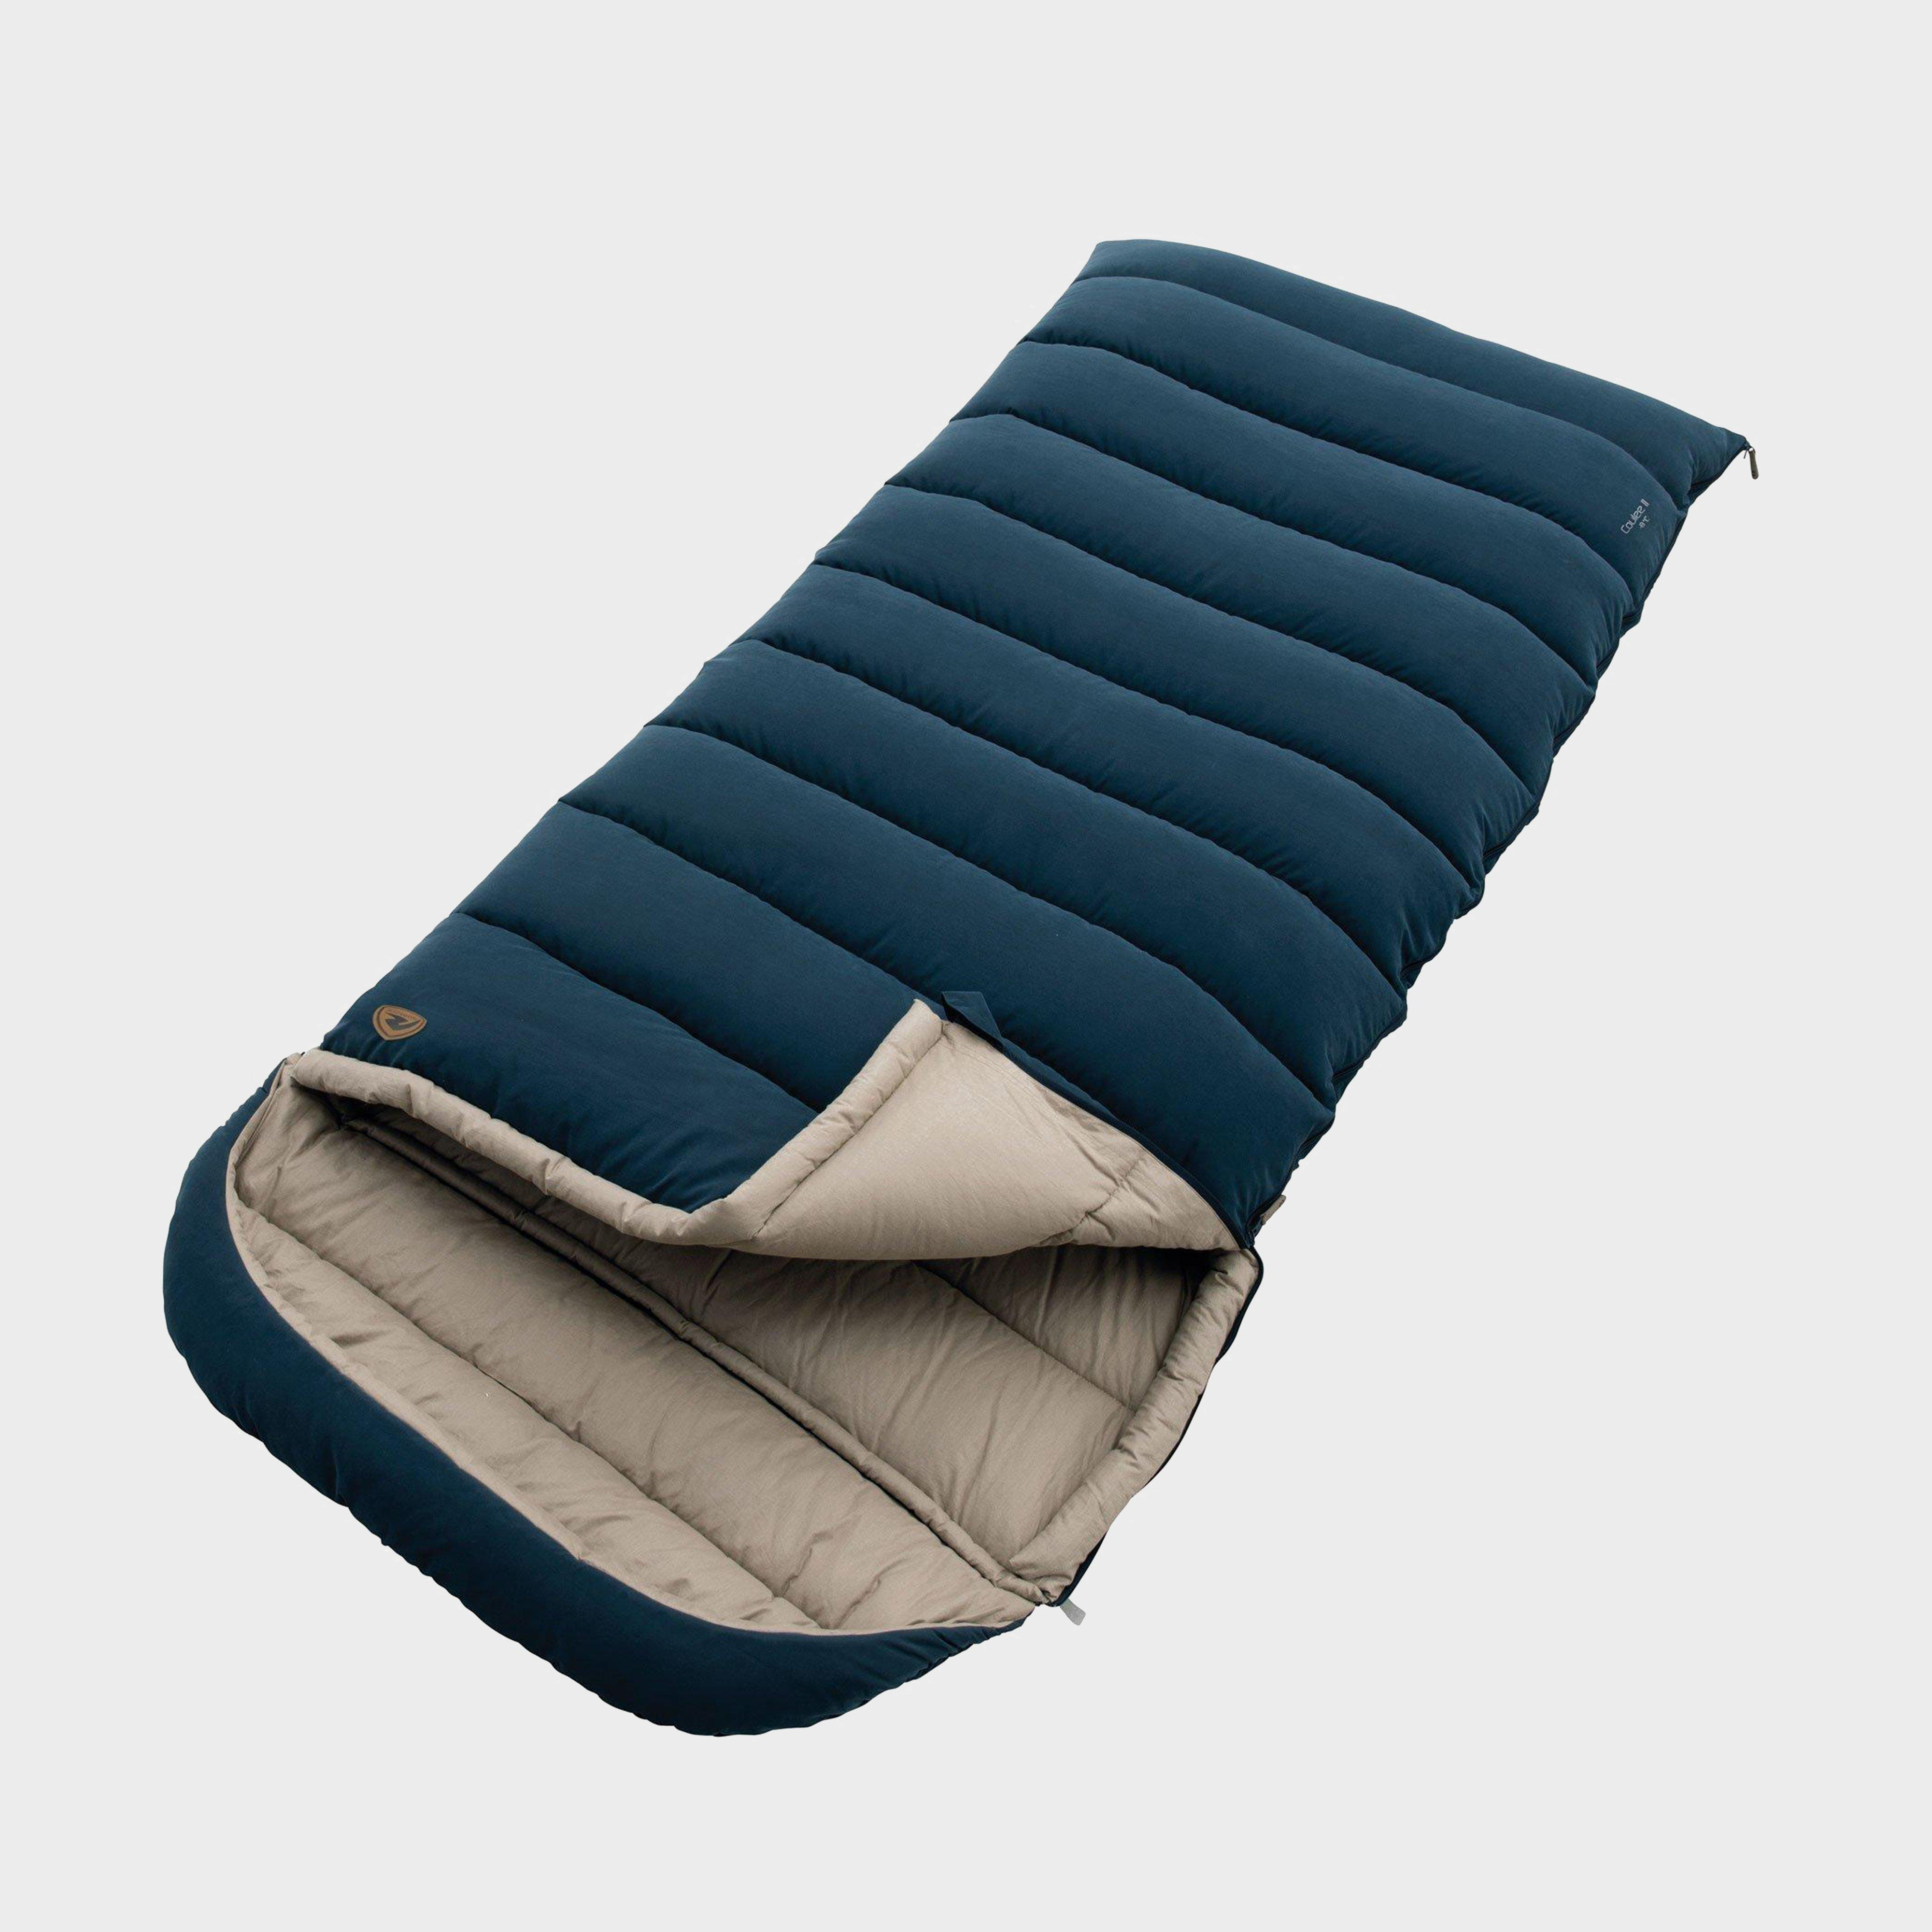 Robens The Coulee Ii Sleeping Bag - Blue, Blue